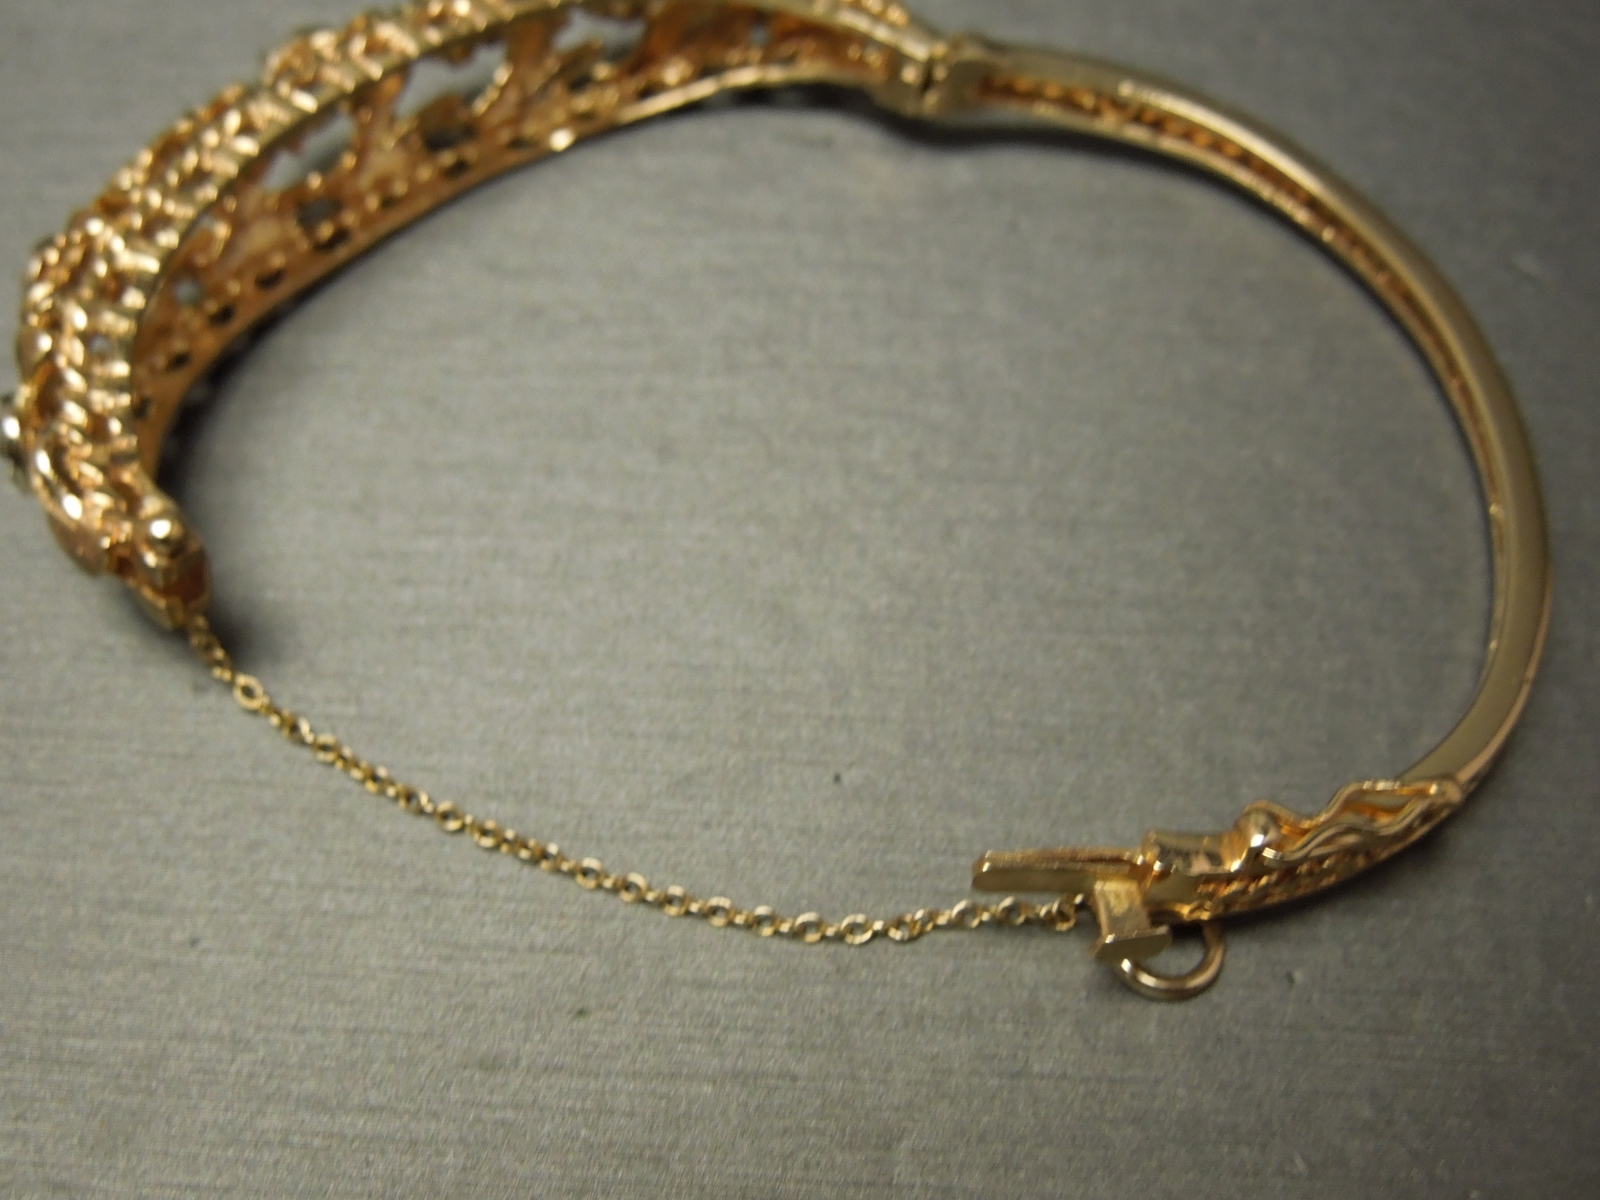 Vintage Diamond Bangle Bracelet 2 50 Tcw 14kt Gold C1960